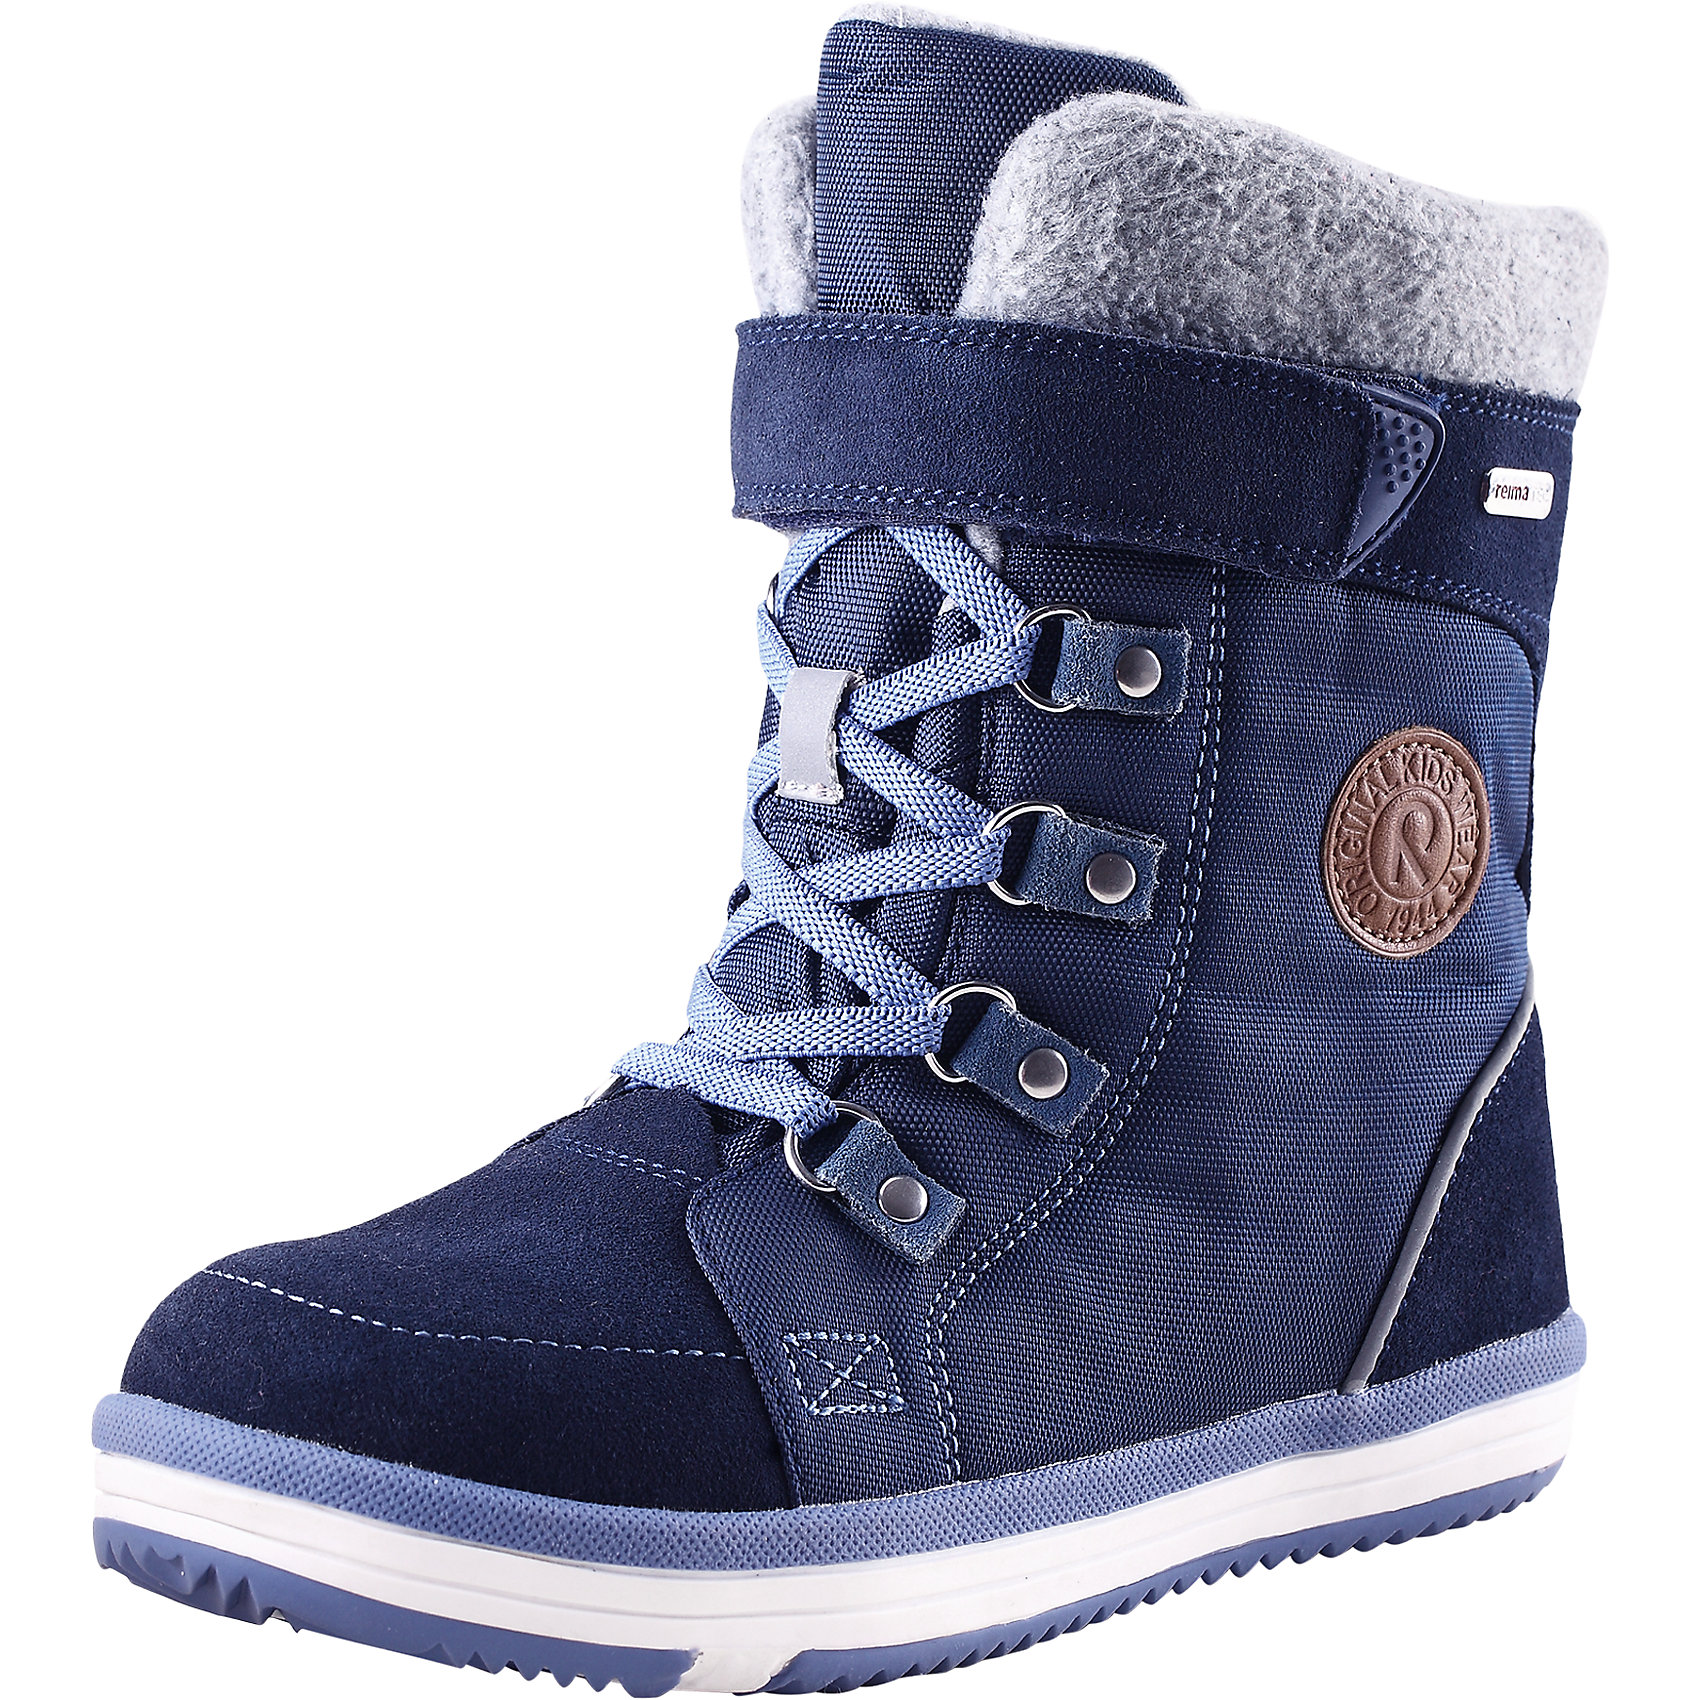 Reima Ботинки Freddo для мальчика Reimatec® Reima reima сапоги slate для мальчика reimatec® reima